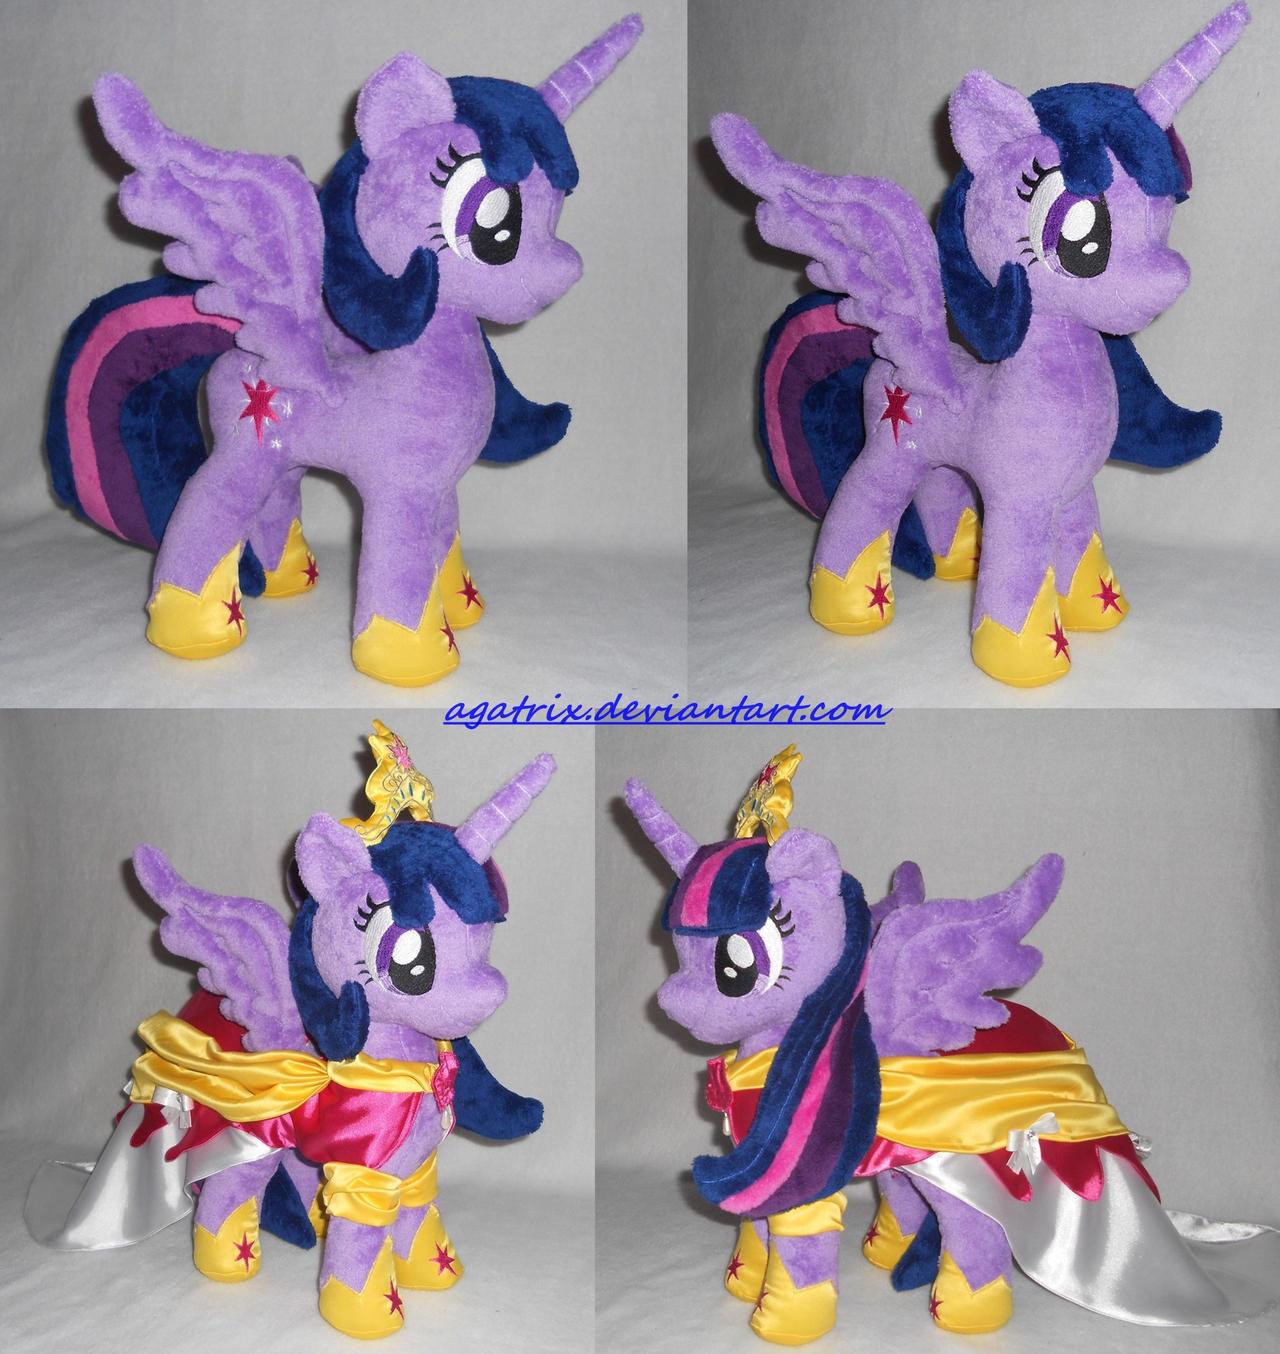 Alicorn Princess Twilight (The Coronation dress) by agatrix